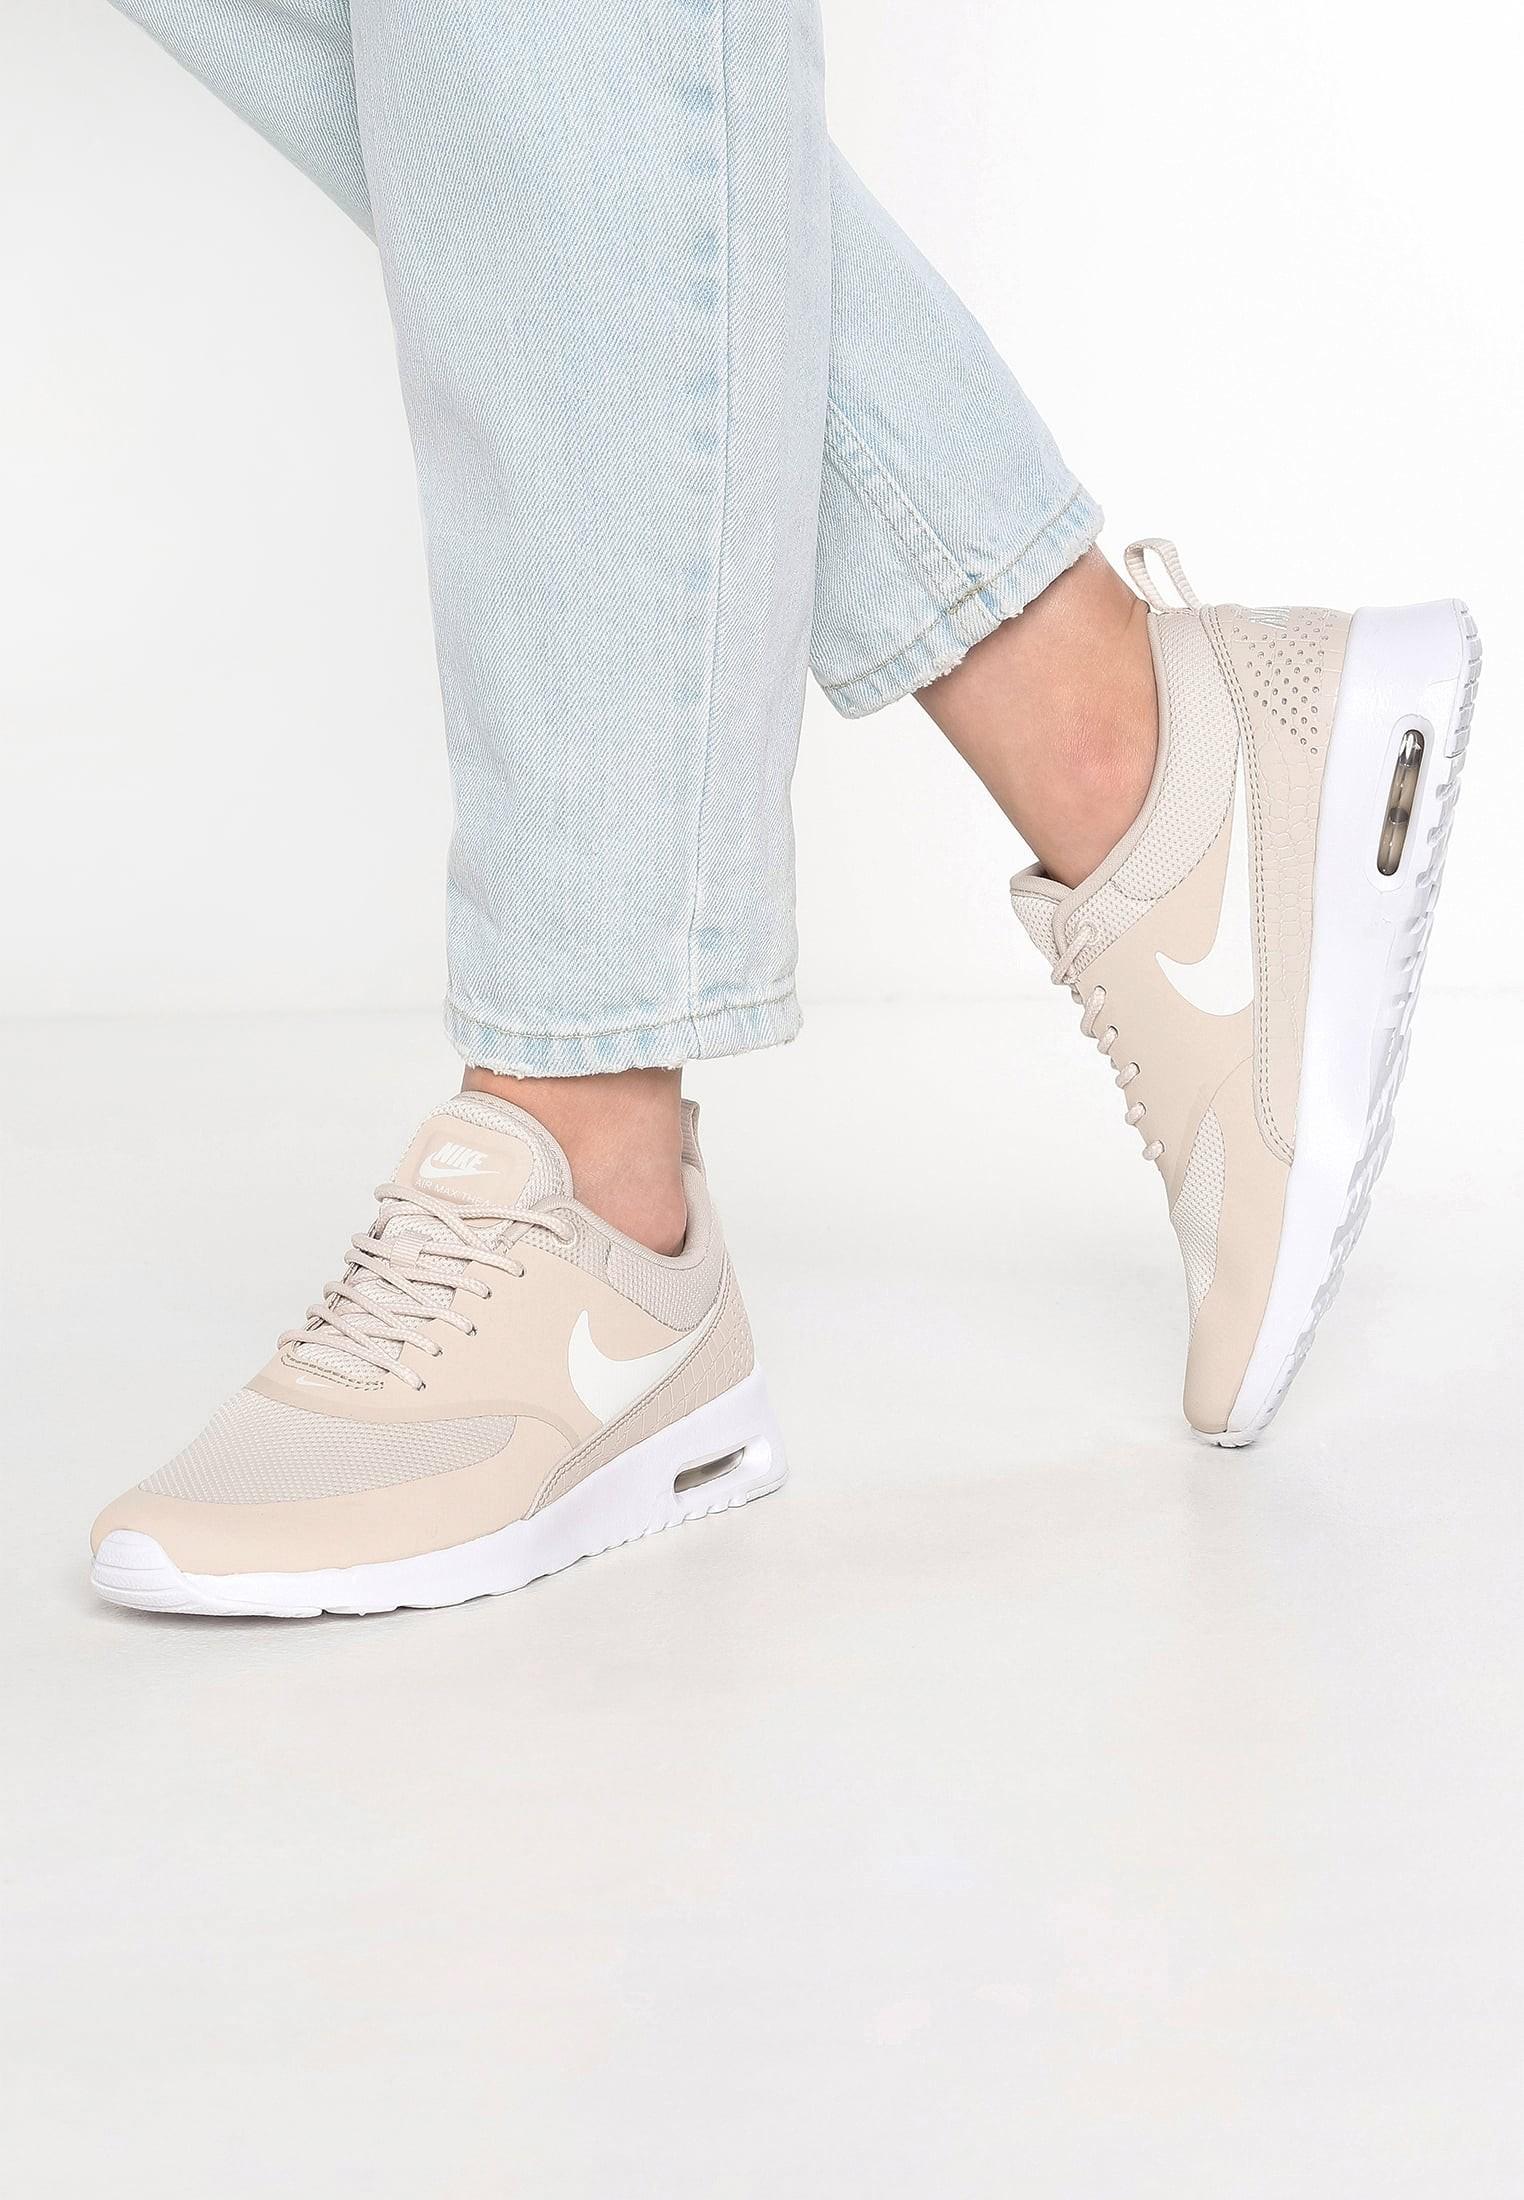 Nike Nike Air Max Thea Damen Sneaker aus Synthetik günstig